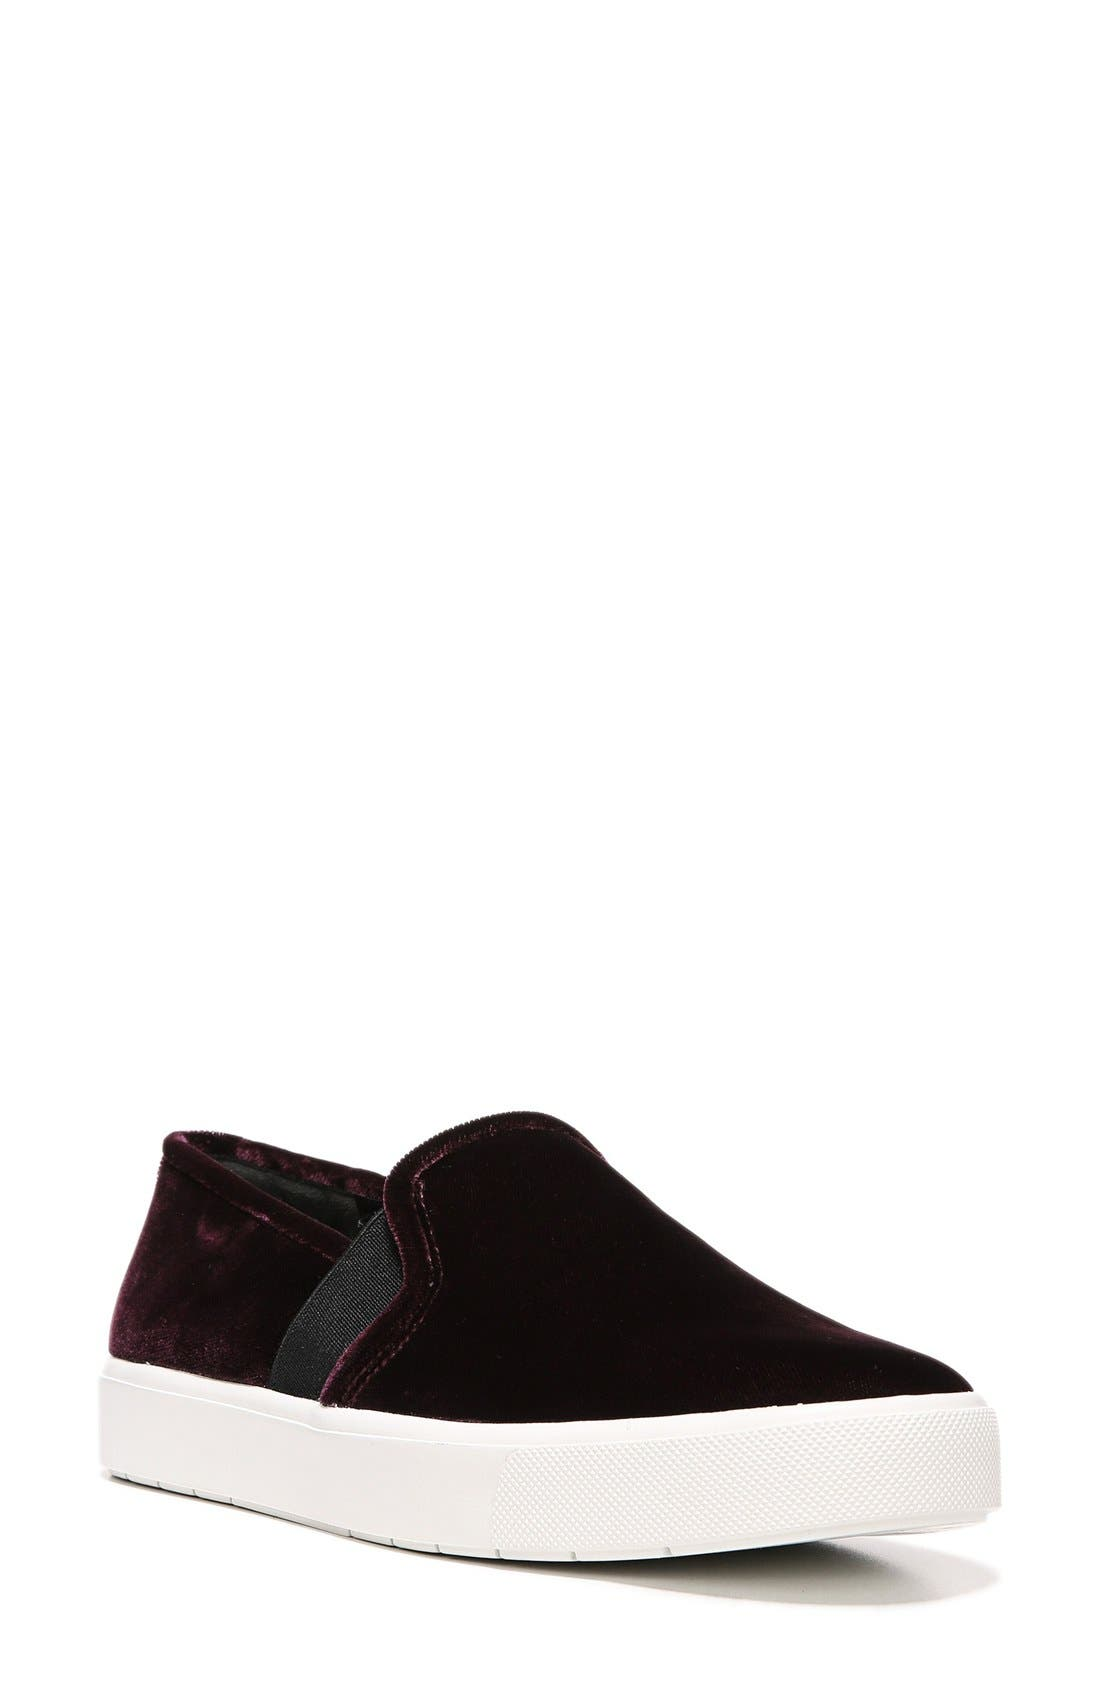 'Blair 12' Slip-On Sneaker,                             Main thumbnail 1, color,                             Oxblood